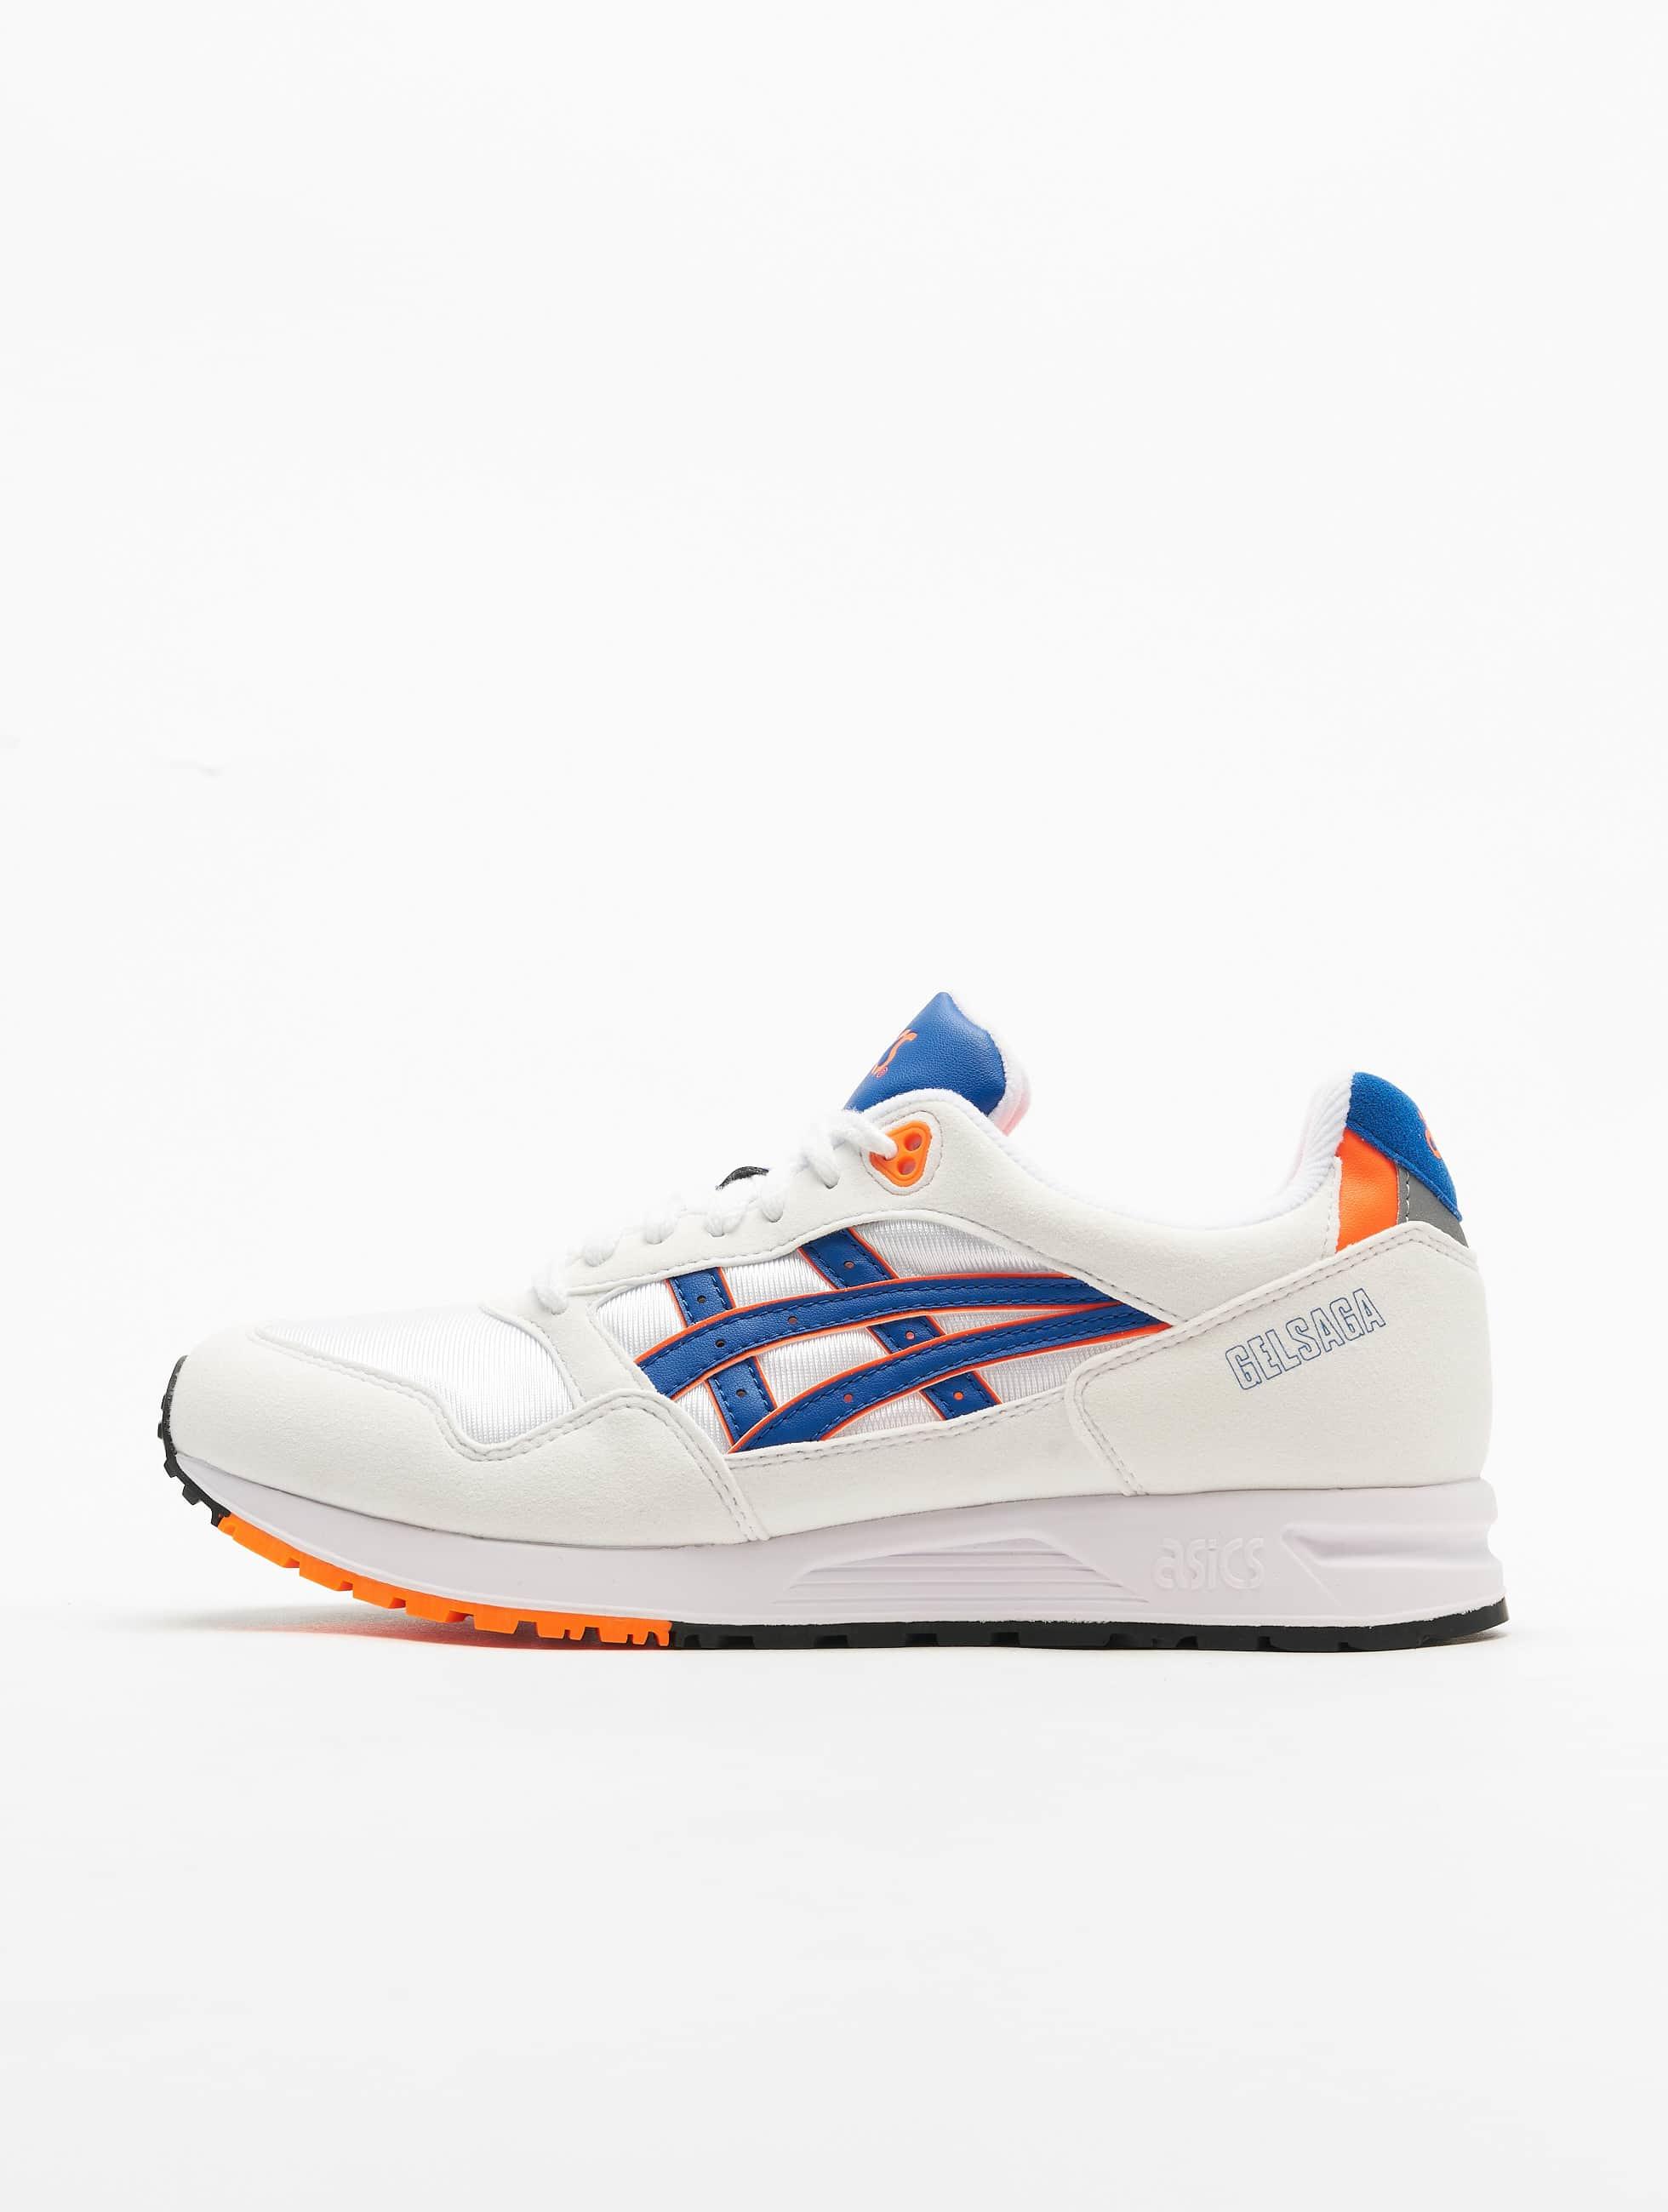 grande vente 0ce8d 9fb62 Asics Tiger Gelsaga Sneakers White/Asics Blue